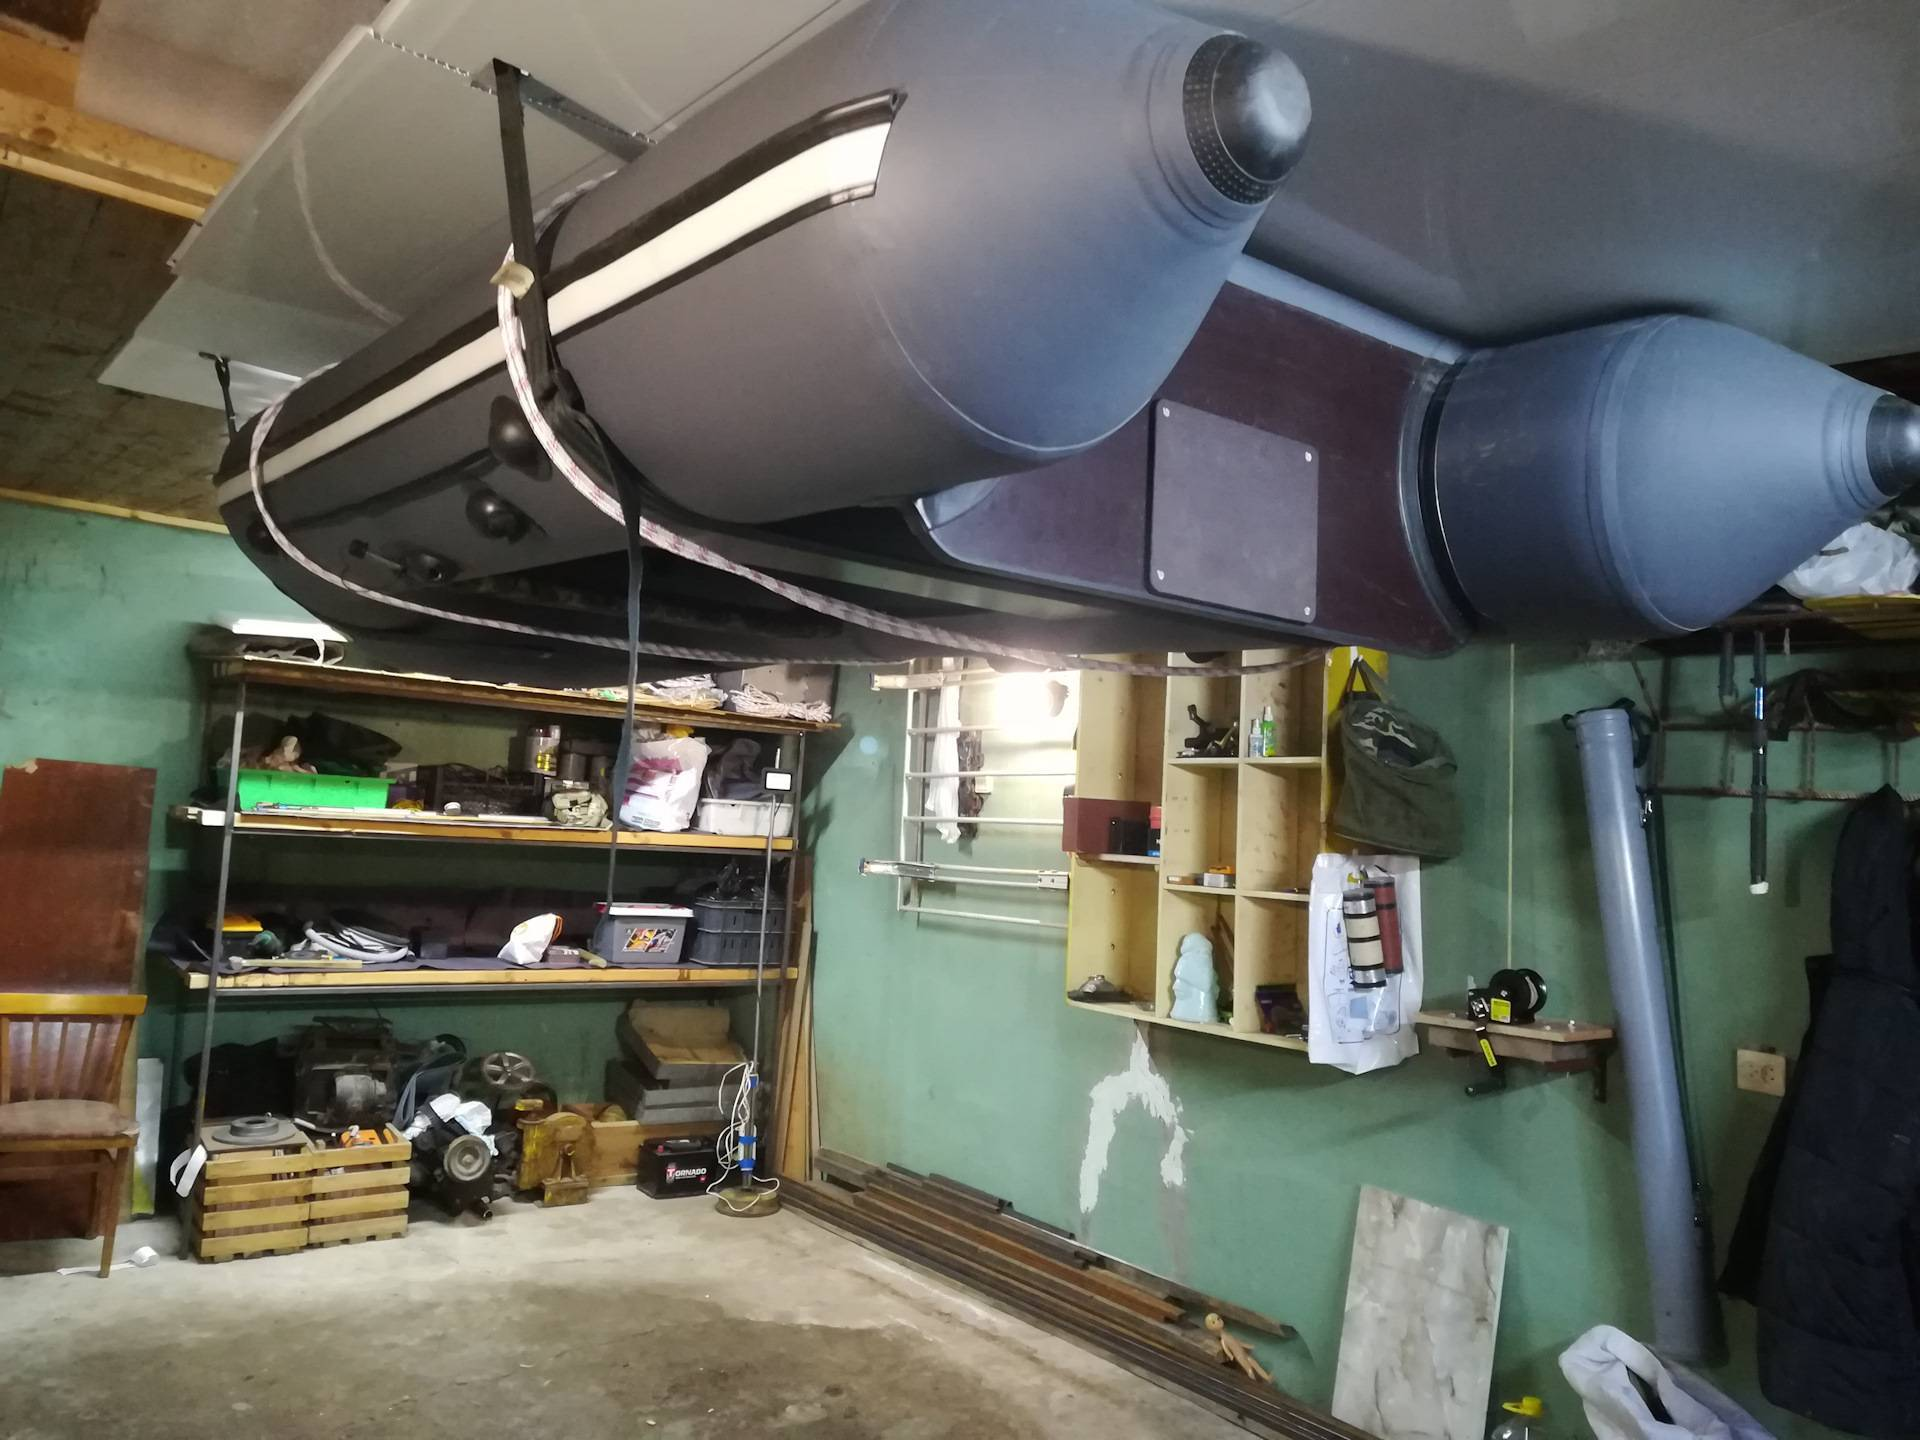 Хранение лодочного мотора зимой